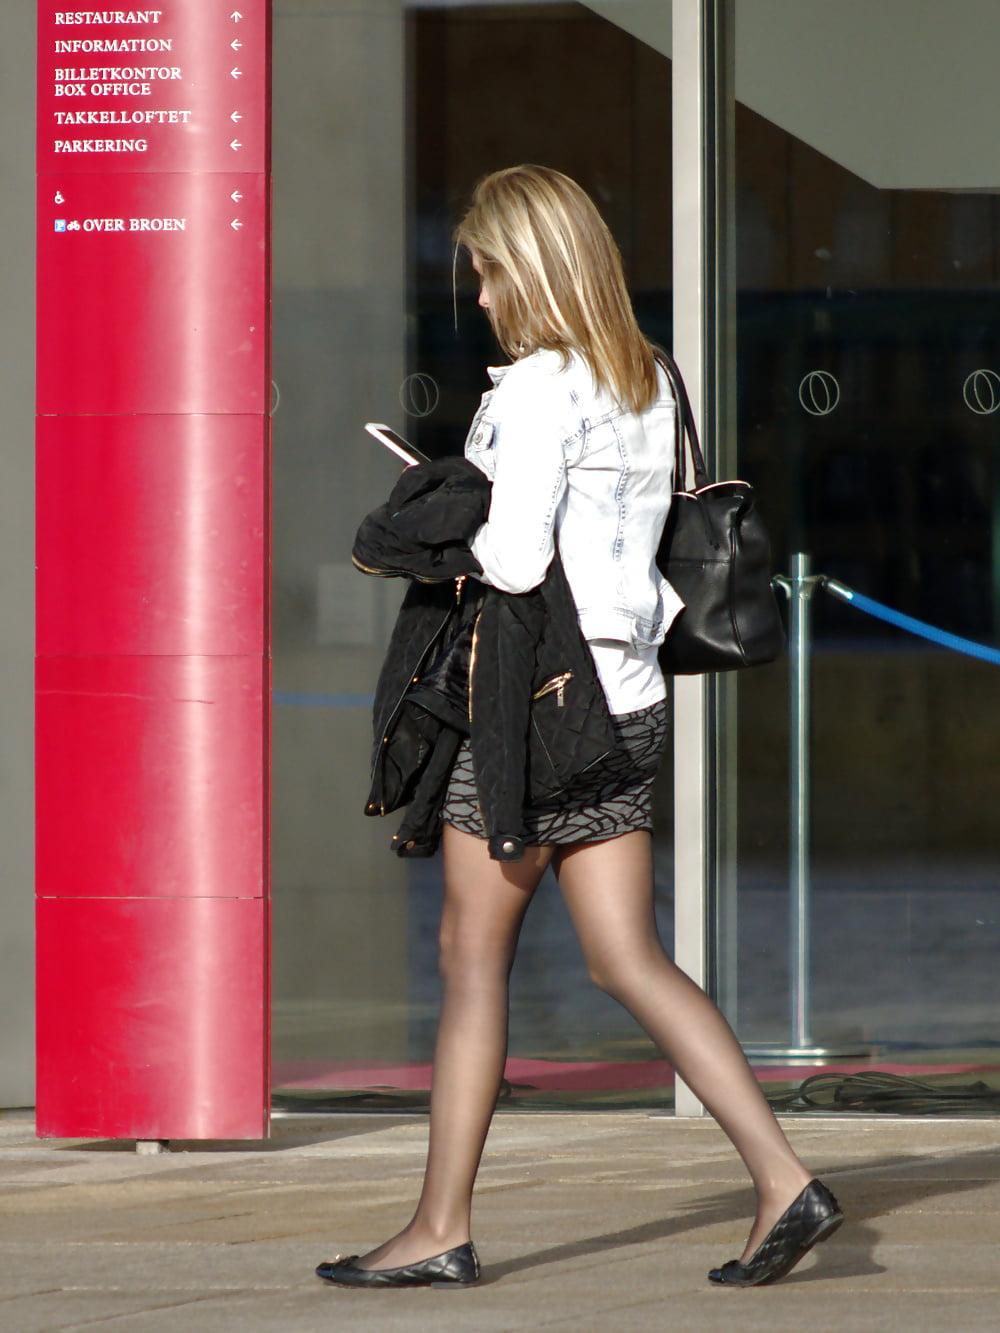 Candid Street Pantyhose Tights -9 - 139 Pics - Xhamstercom-6670